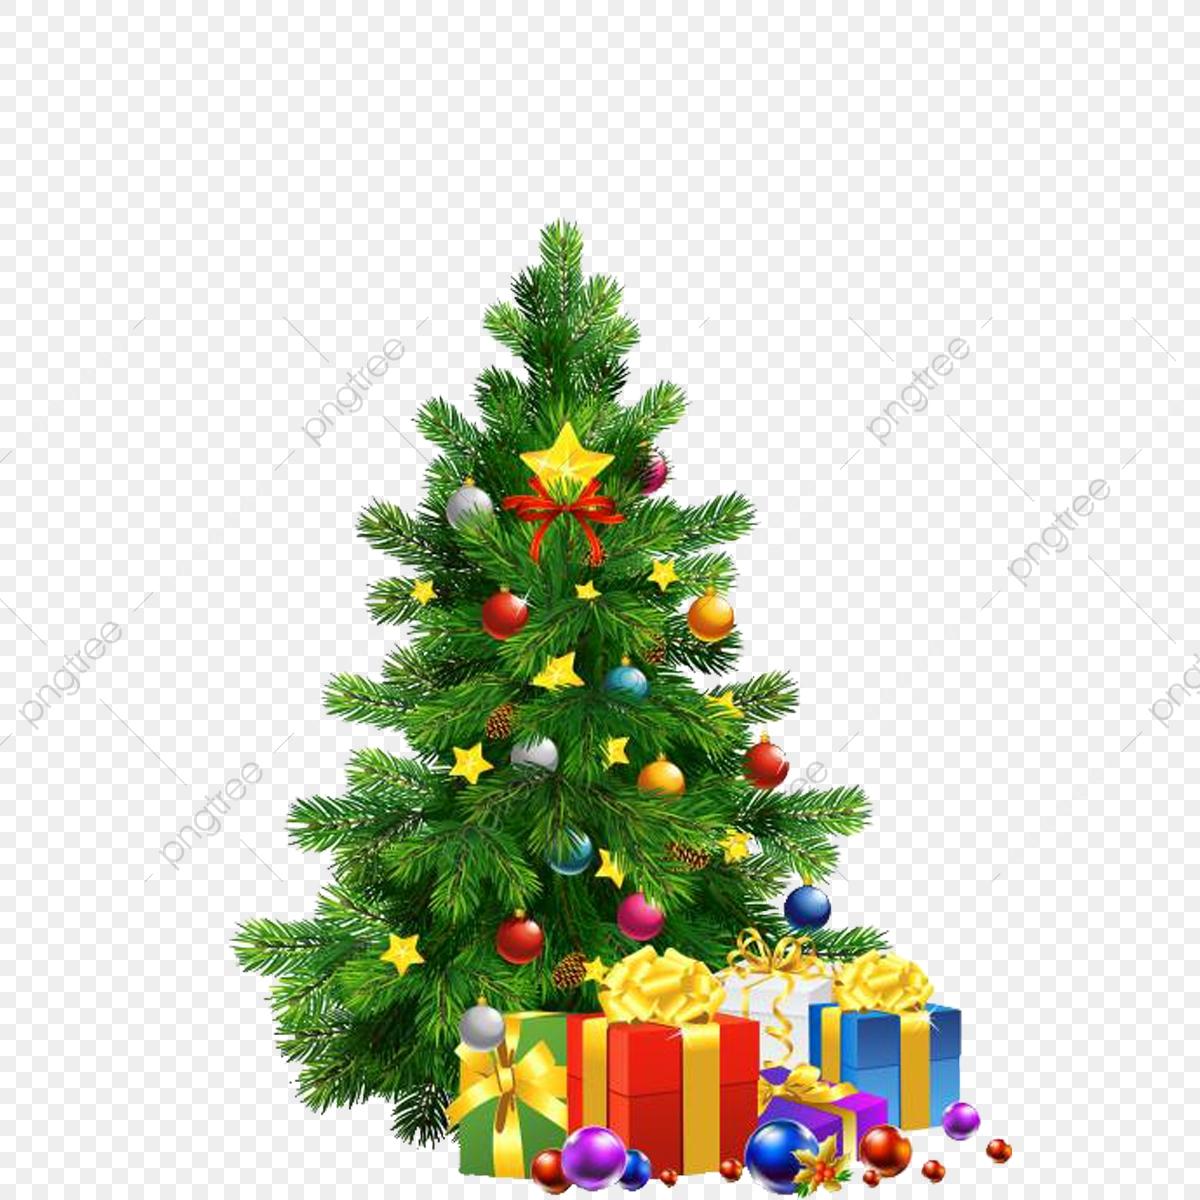 árvore De Natal Png Noel Cristo Arquivo Png E Psd Para